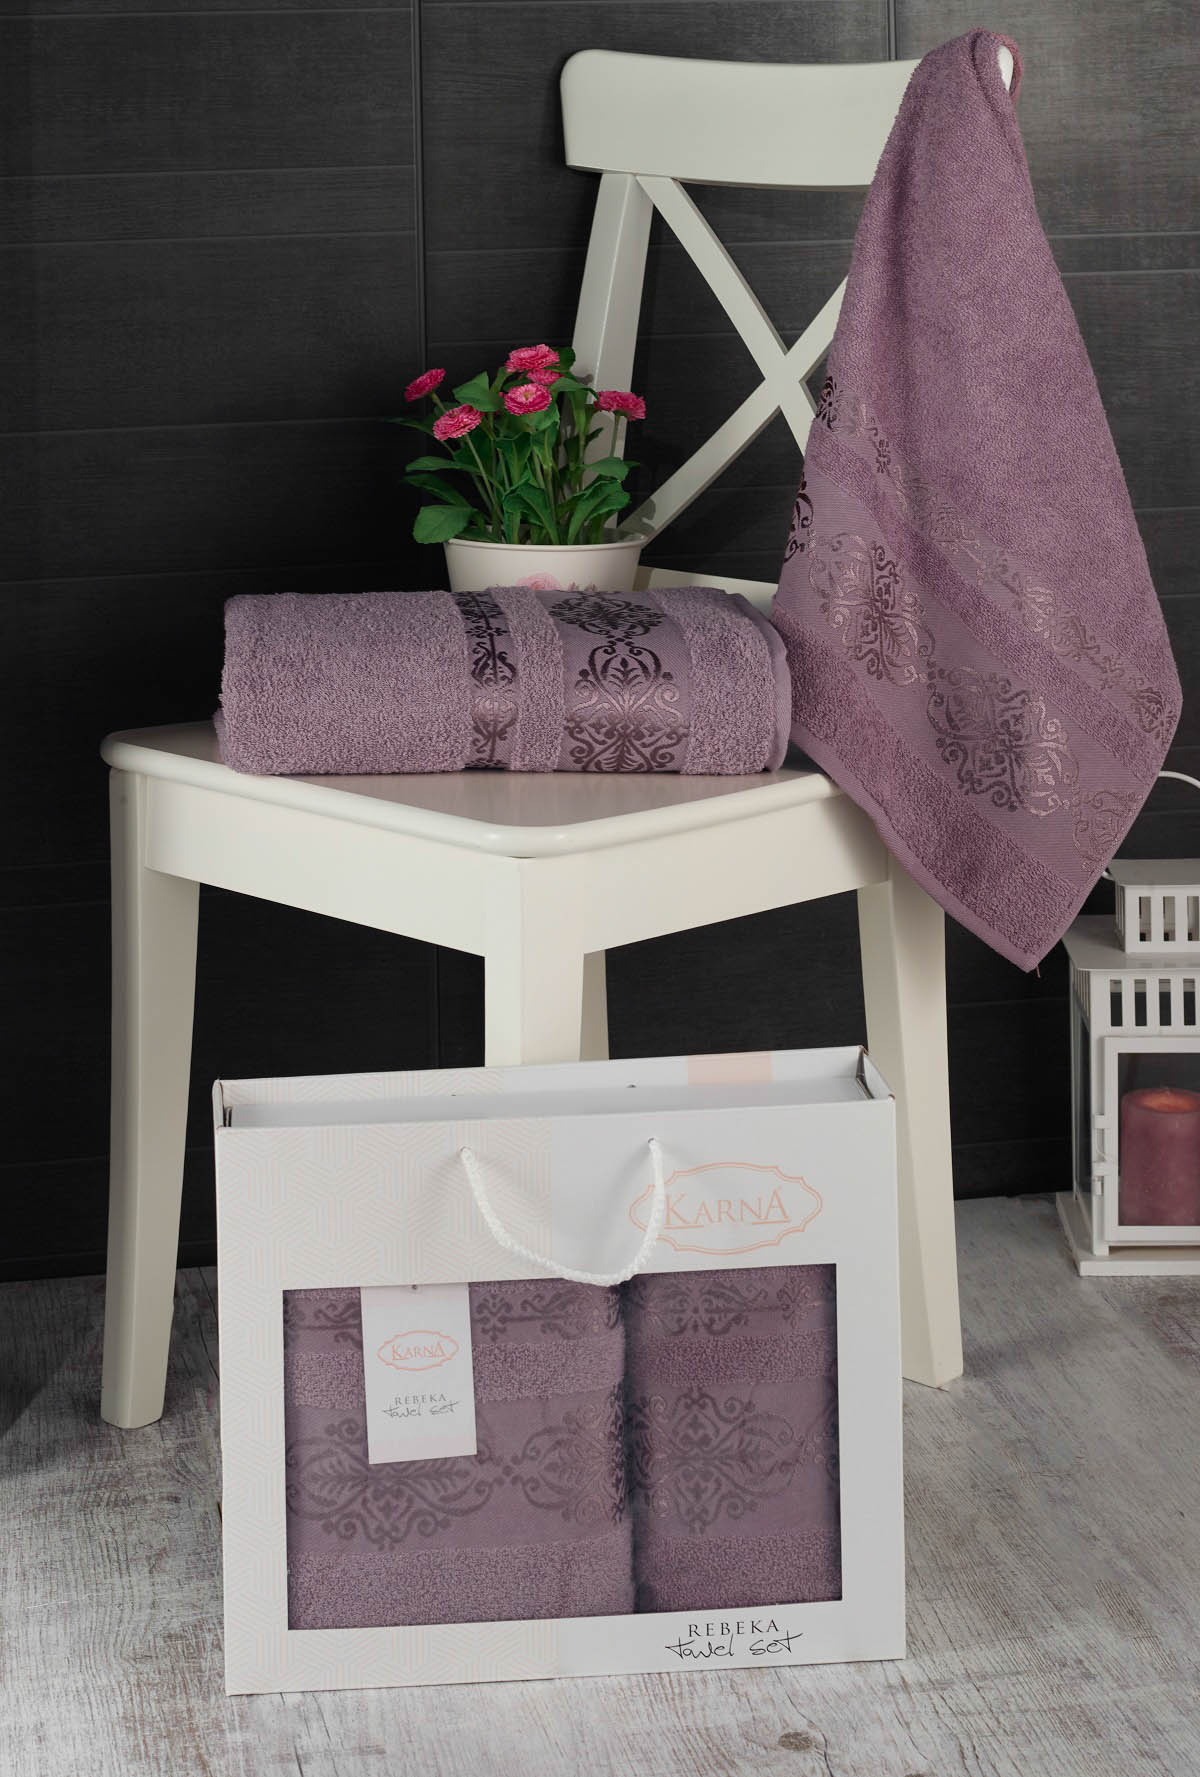 Полотенца Karna Полотенце Rebeca Цвет: Светло-Лаванда (50х90 см,70х140 см) цены онлайн